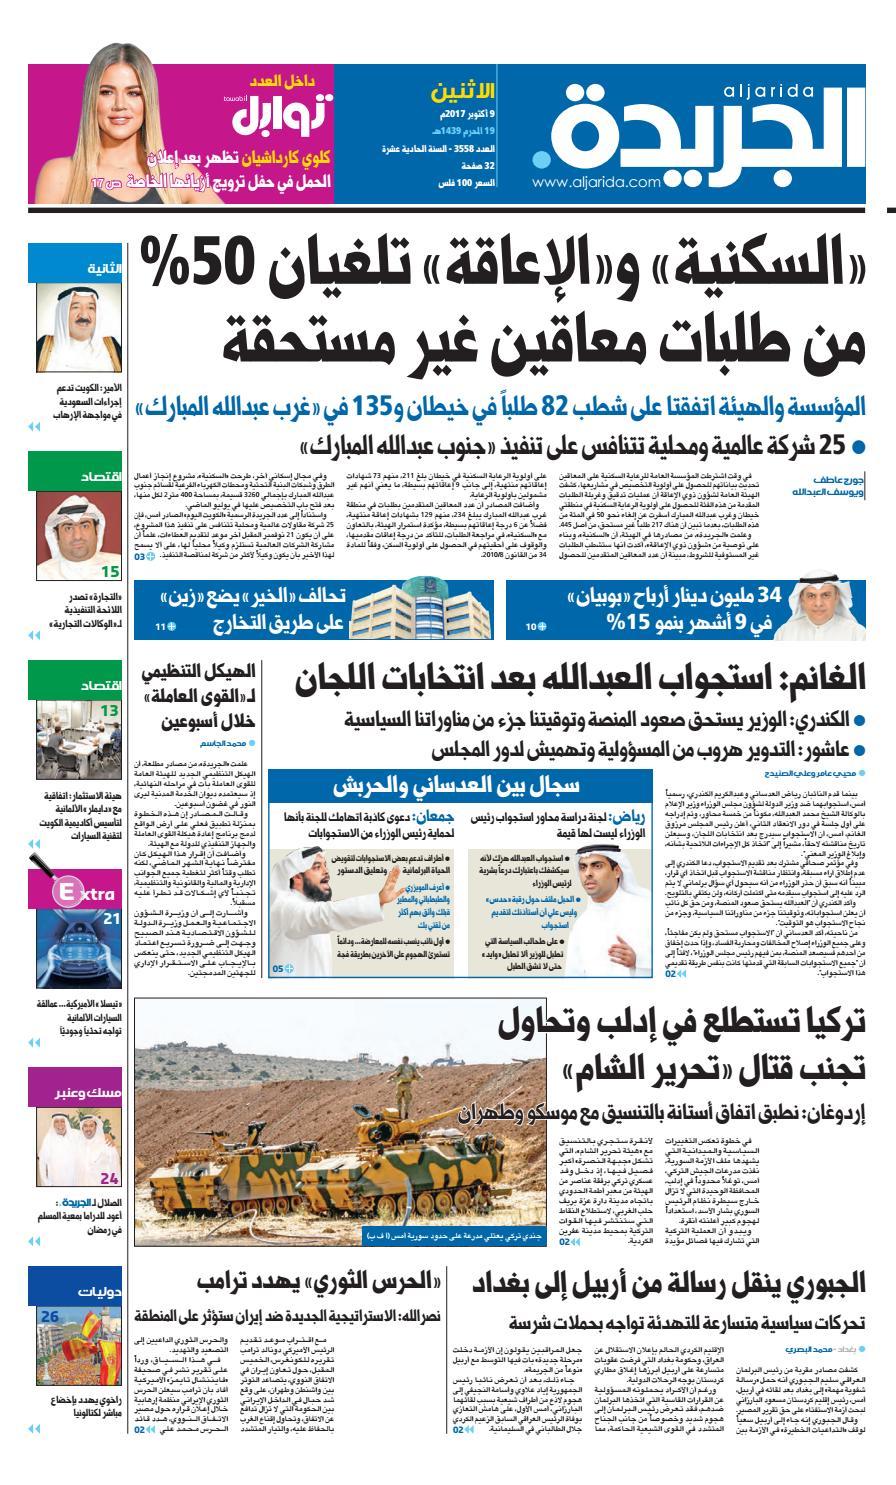 c3b1d4c81 عدد الجريدة الأثنين 9 أكتوبر 2017 by Aljarida Newspaper - issuu